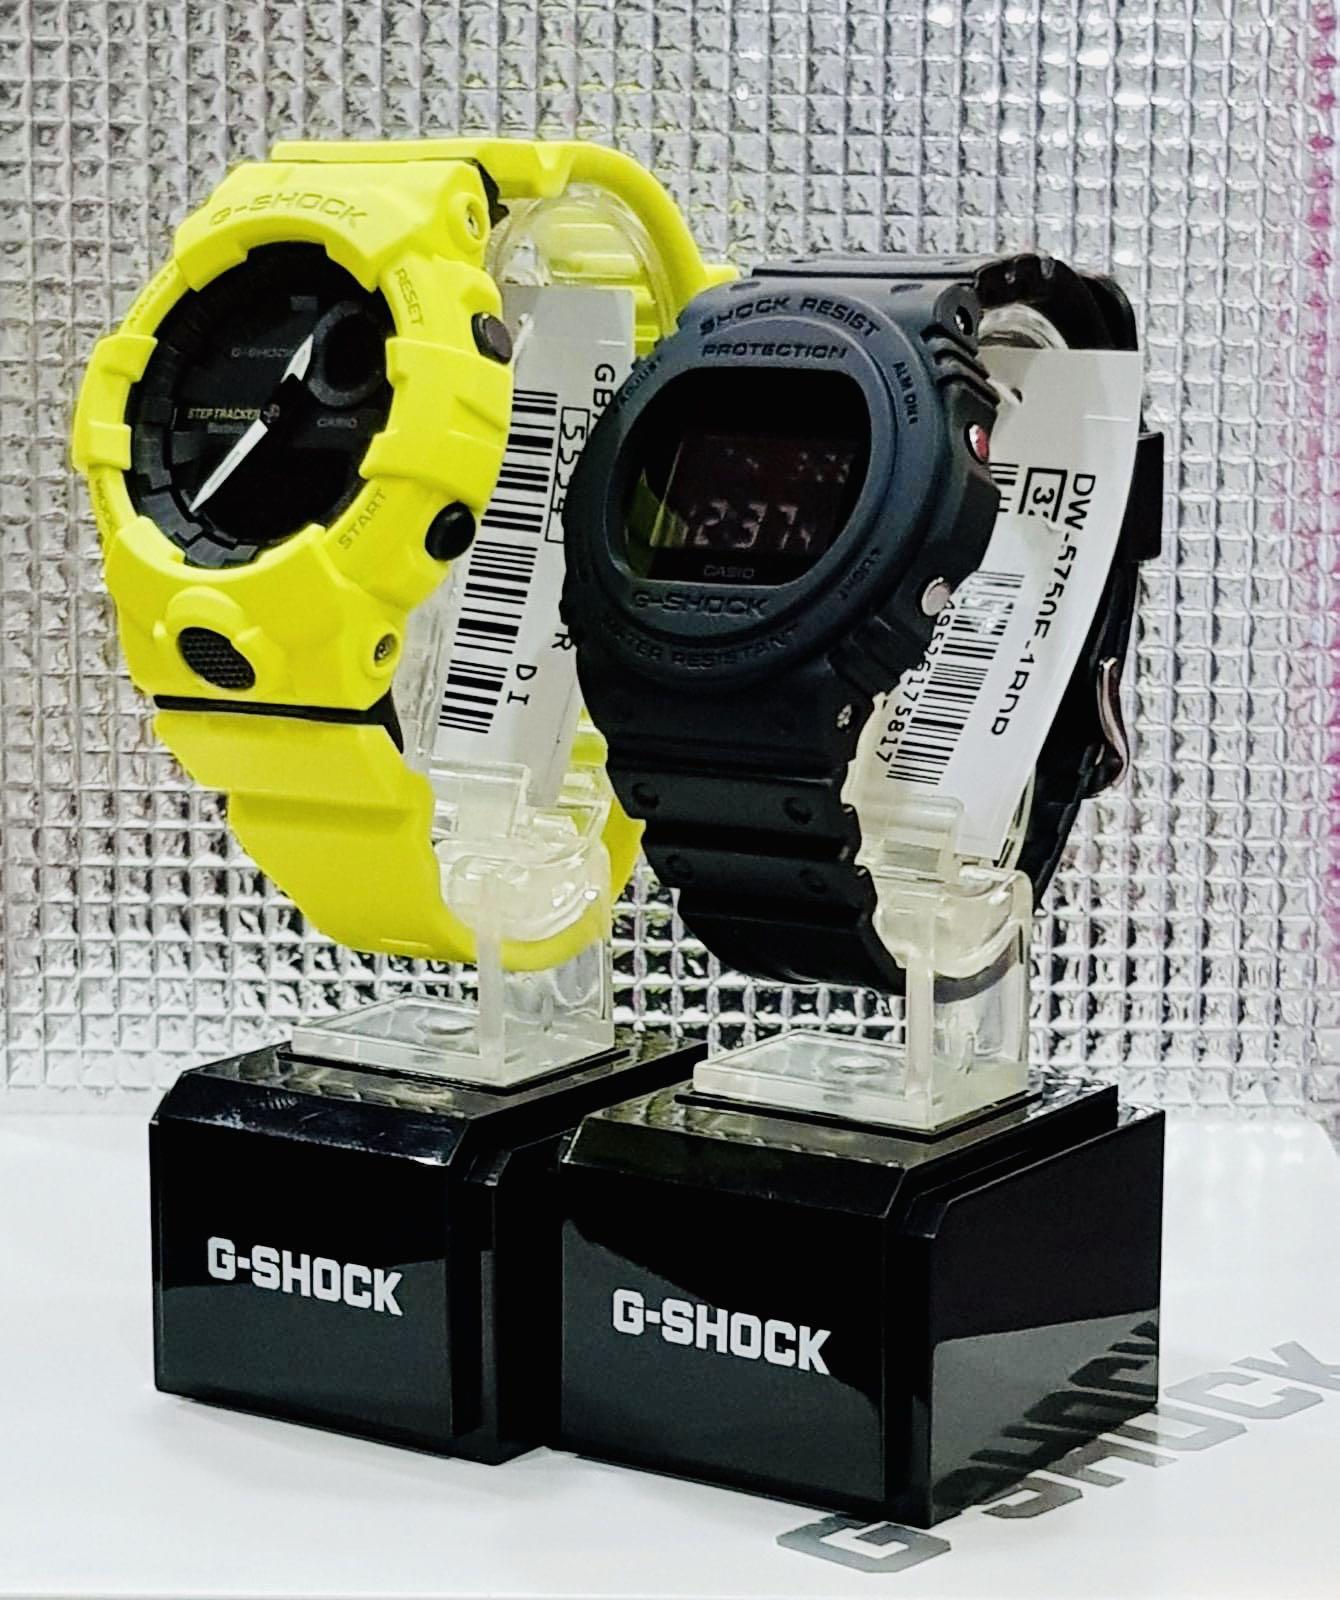 NEW🌟COUPLE💝SET : BABYG + GSHOCK DIVER UNISEX SPORTS WATCH  : 100% ORIGINAL AUTHENTIC CASIO BABY-G-SHOCK : DW-5750E-1 + GBA-800-9A